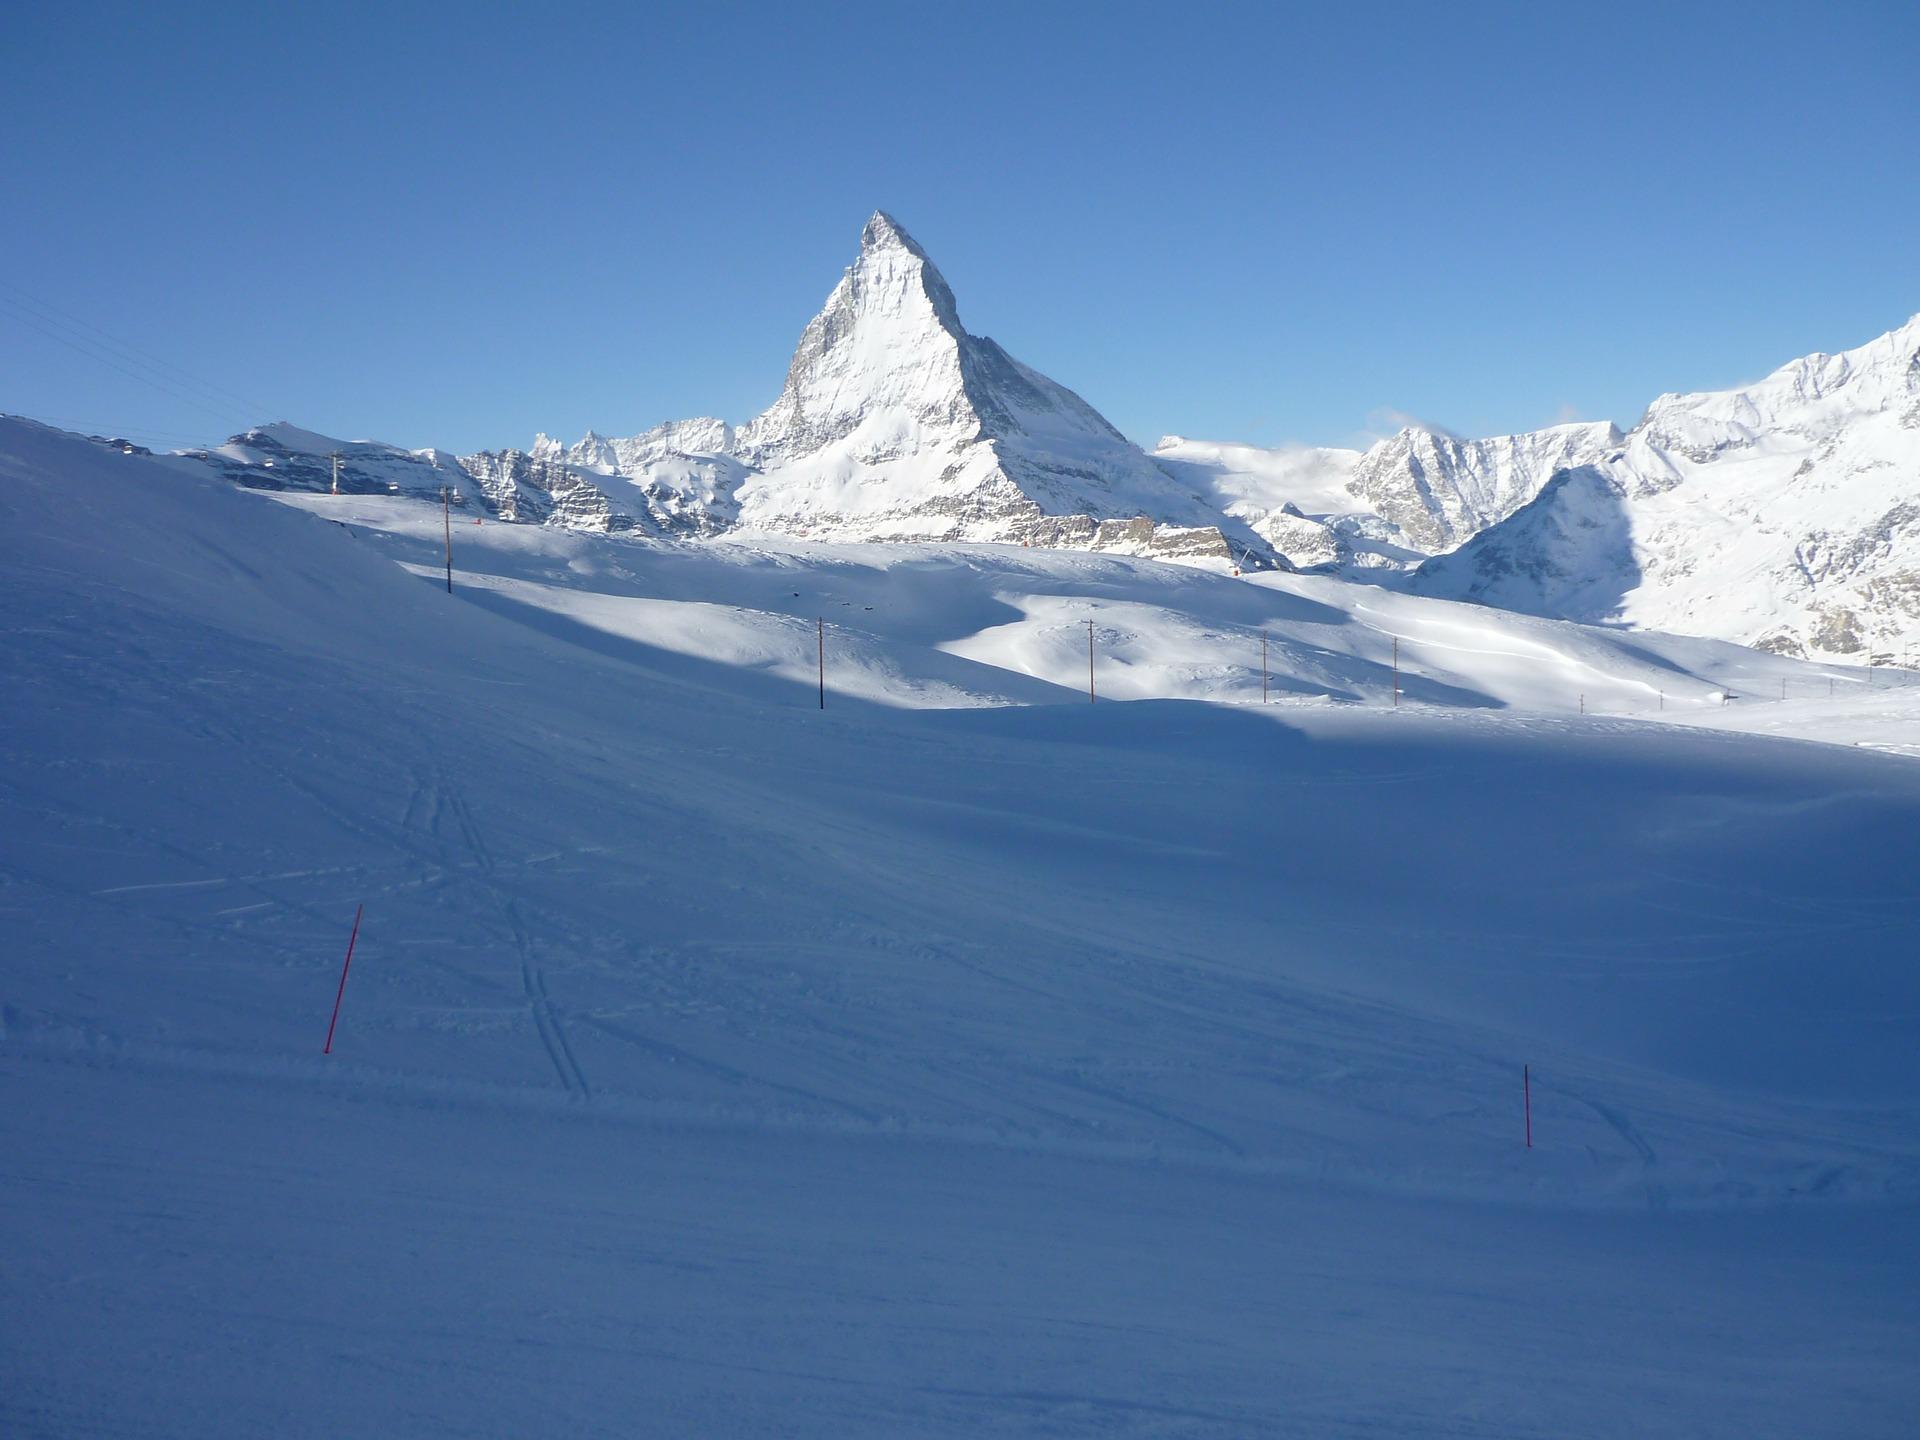 Zermatt - 10 top ski resorts in Switzerland